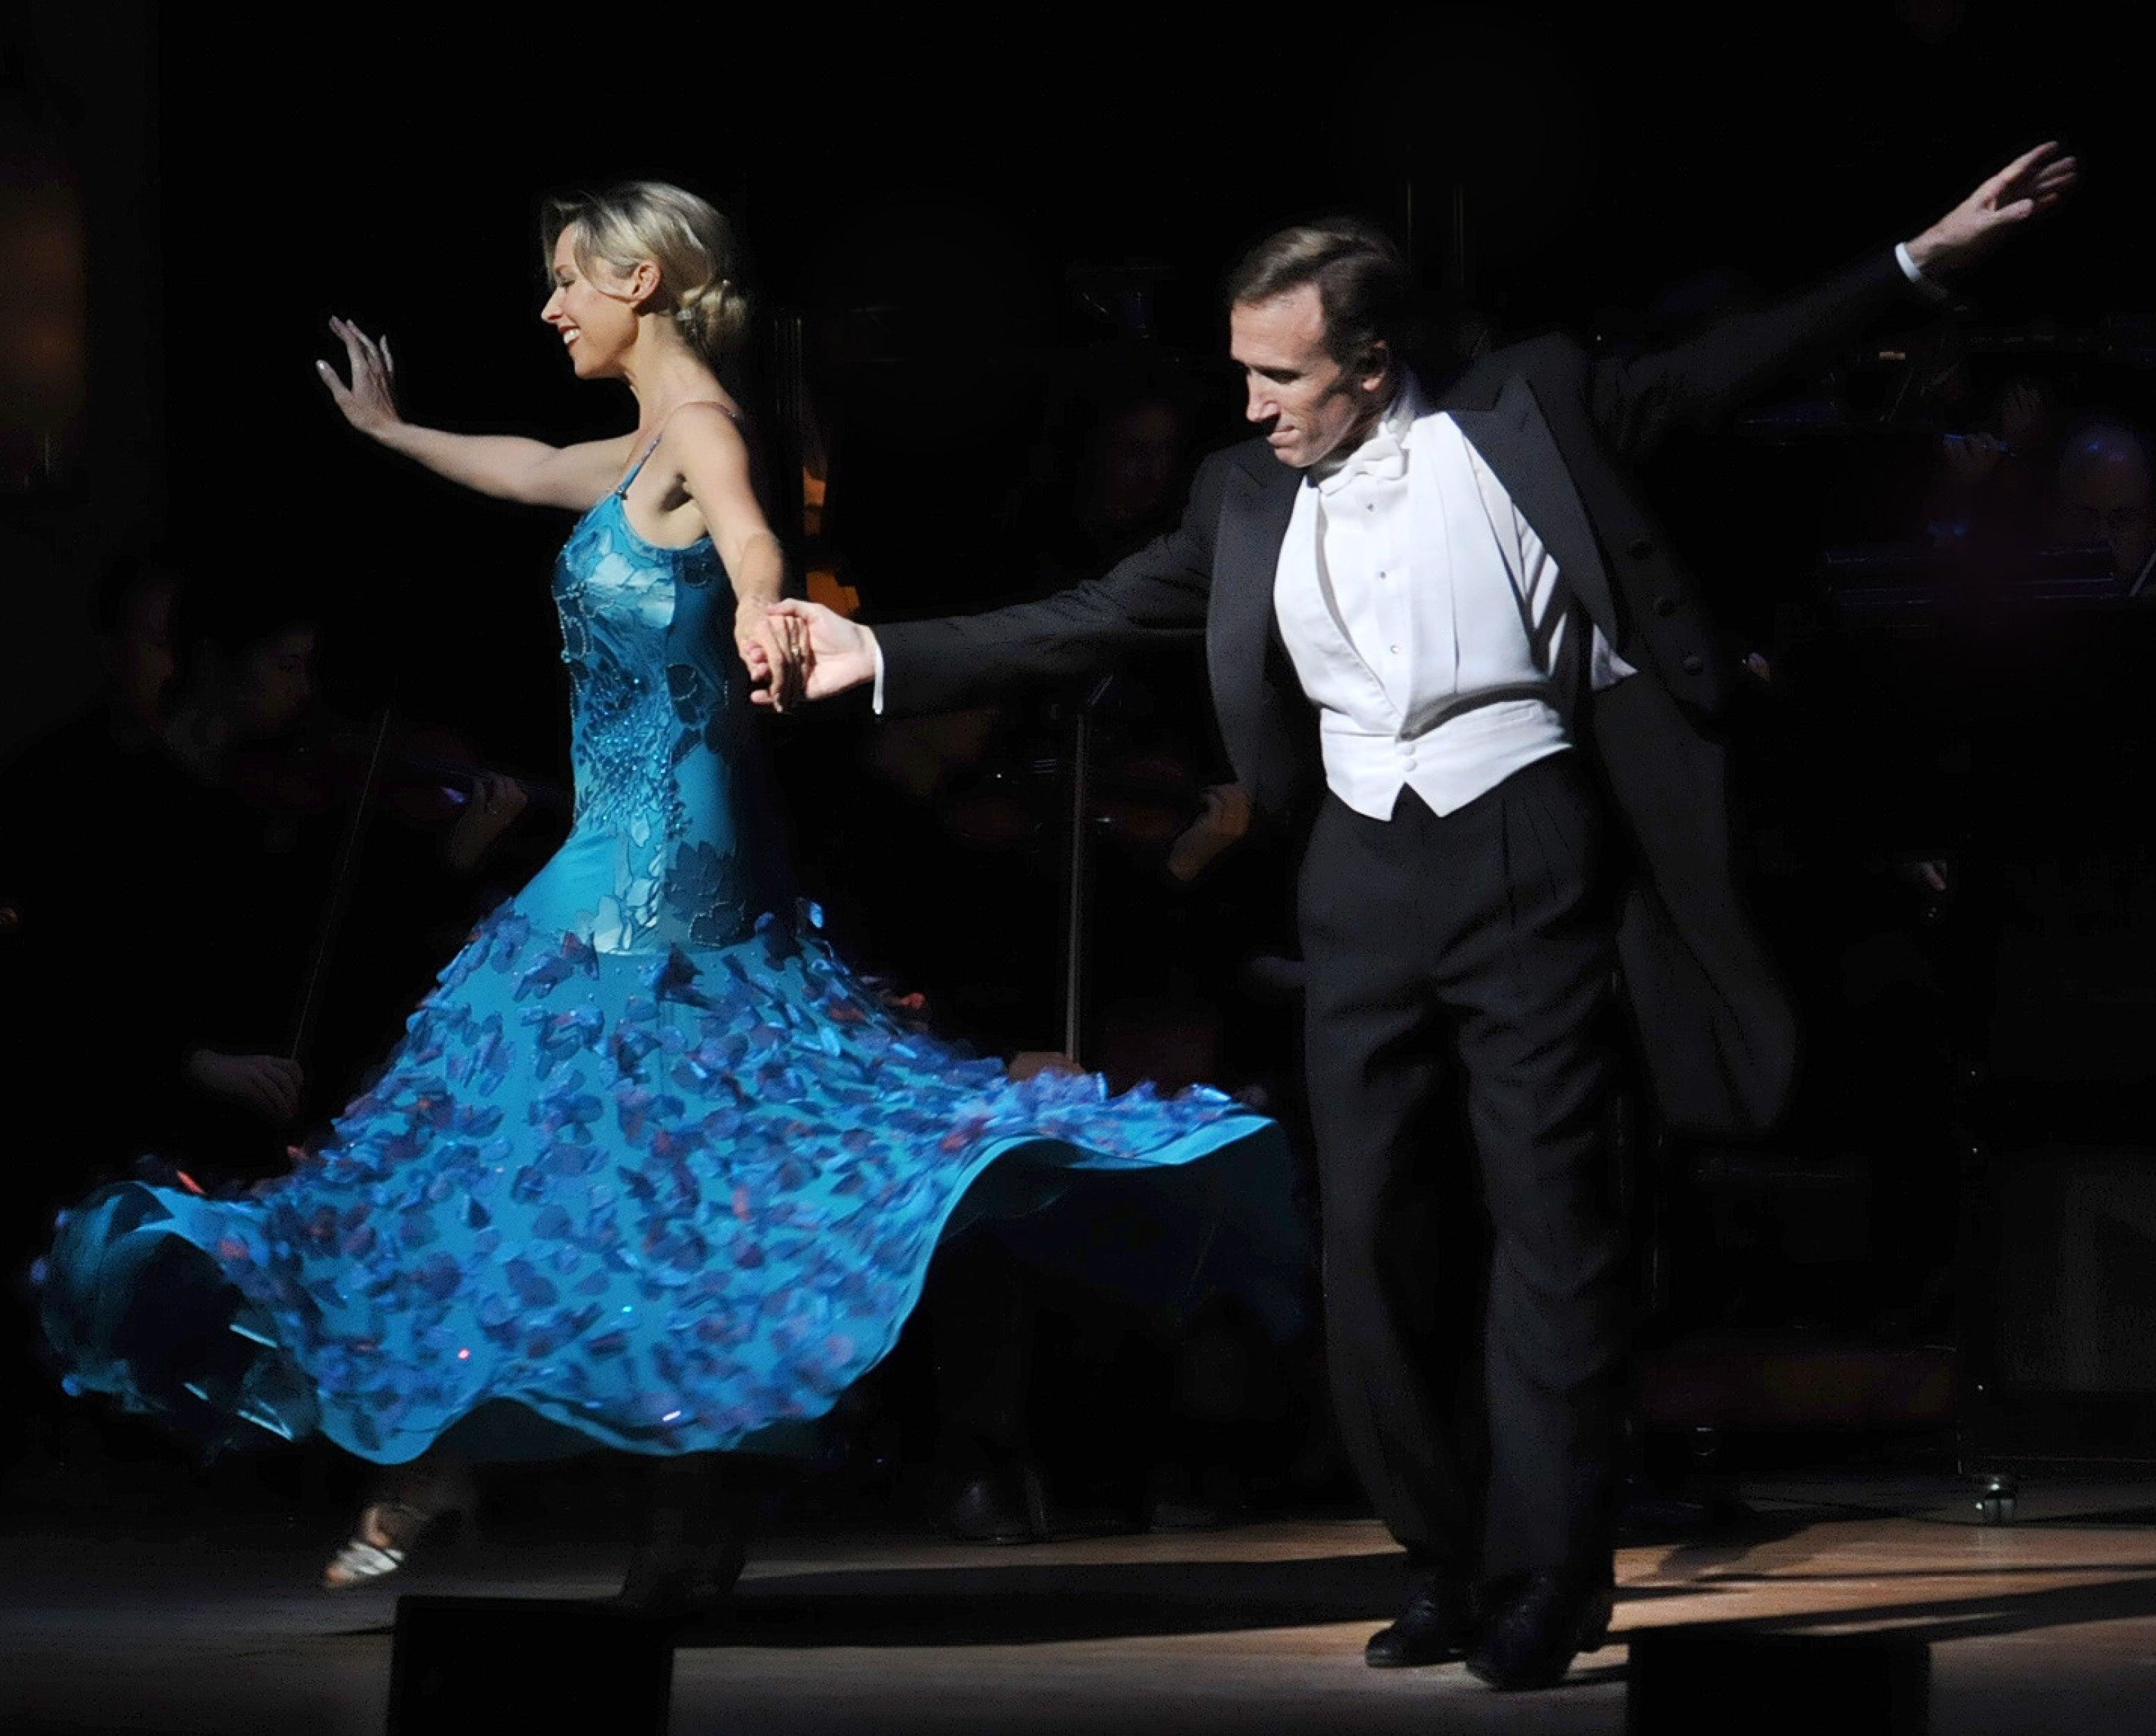 POPS3 - Dancing & Romancing (2180x915).jpg